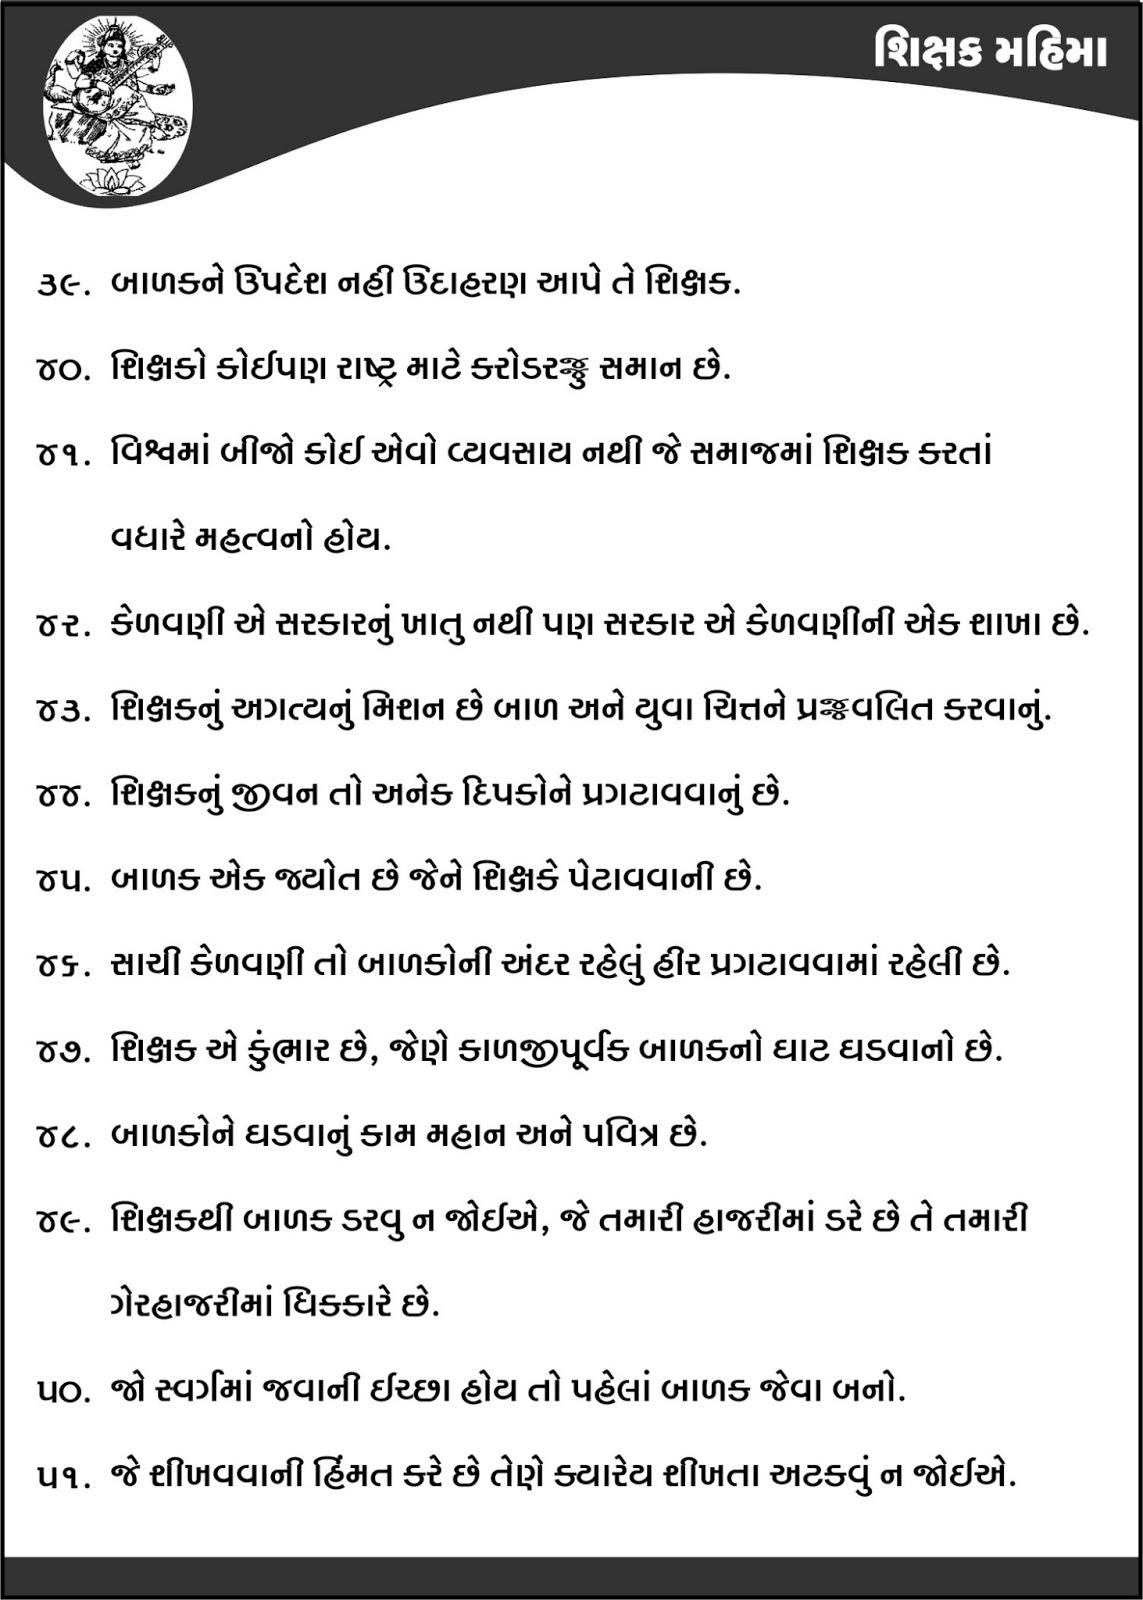 004 Essay Example25252bglories25252b4 On Marvelous Teacher Teachers Day In Odia Argumentative Carrying Guns Importance Hindi Full